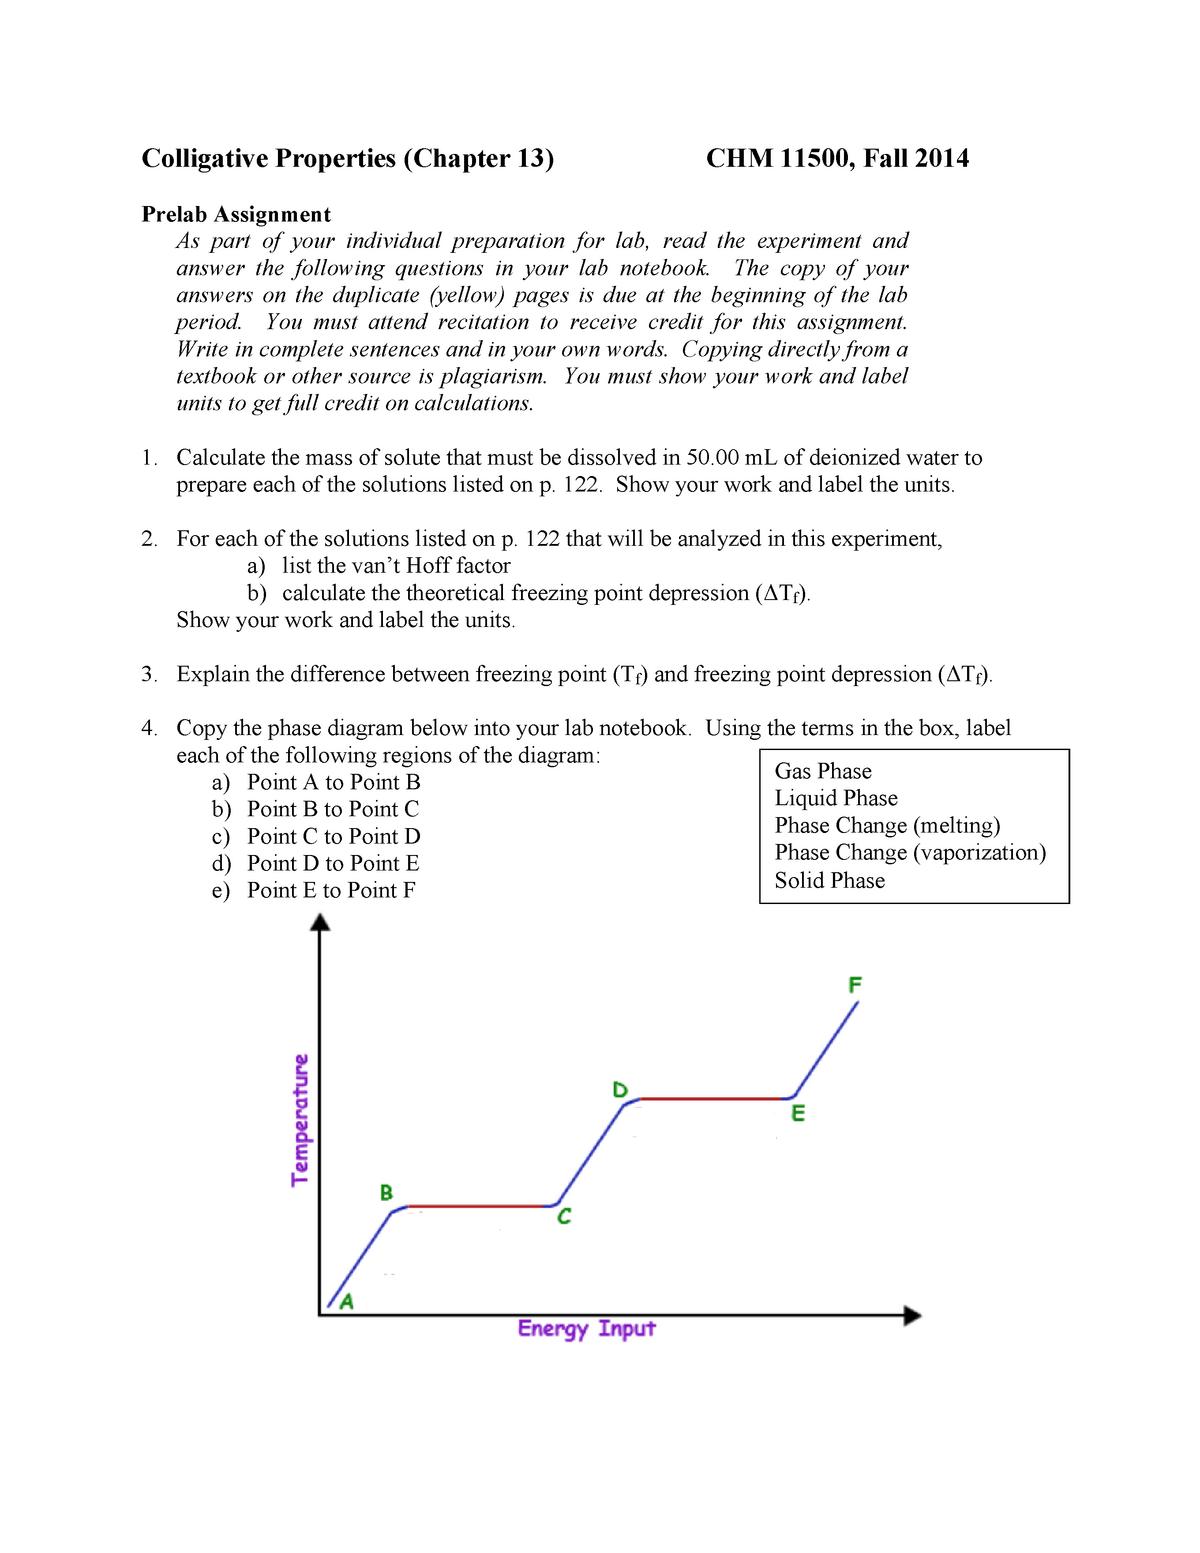 Colligative Properties Prelab - StuDocu